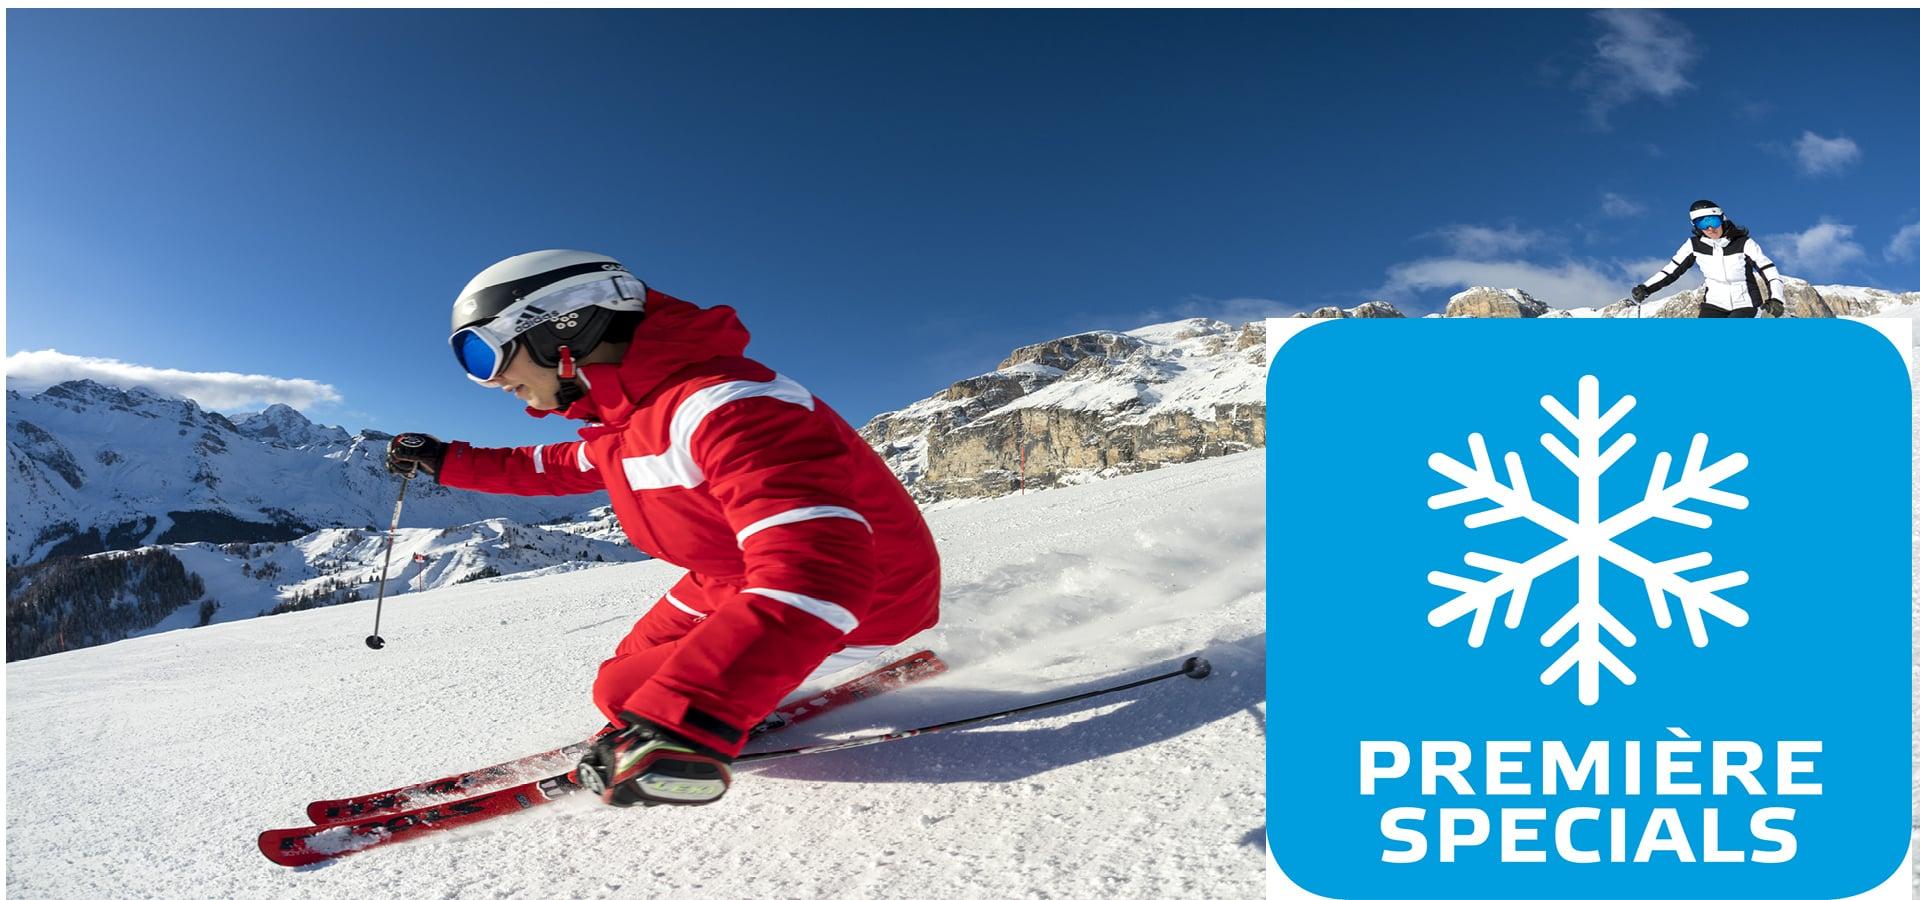 Dolomiti Super Première 2018